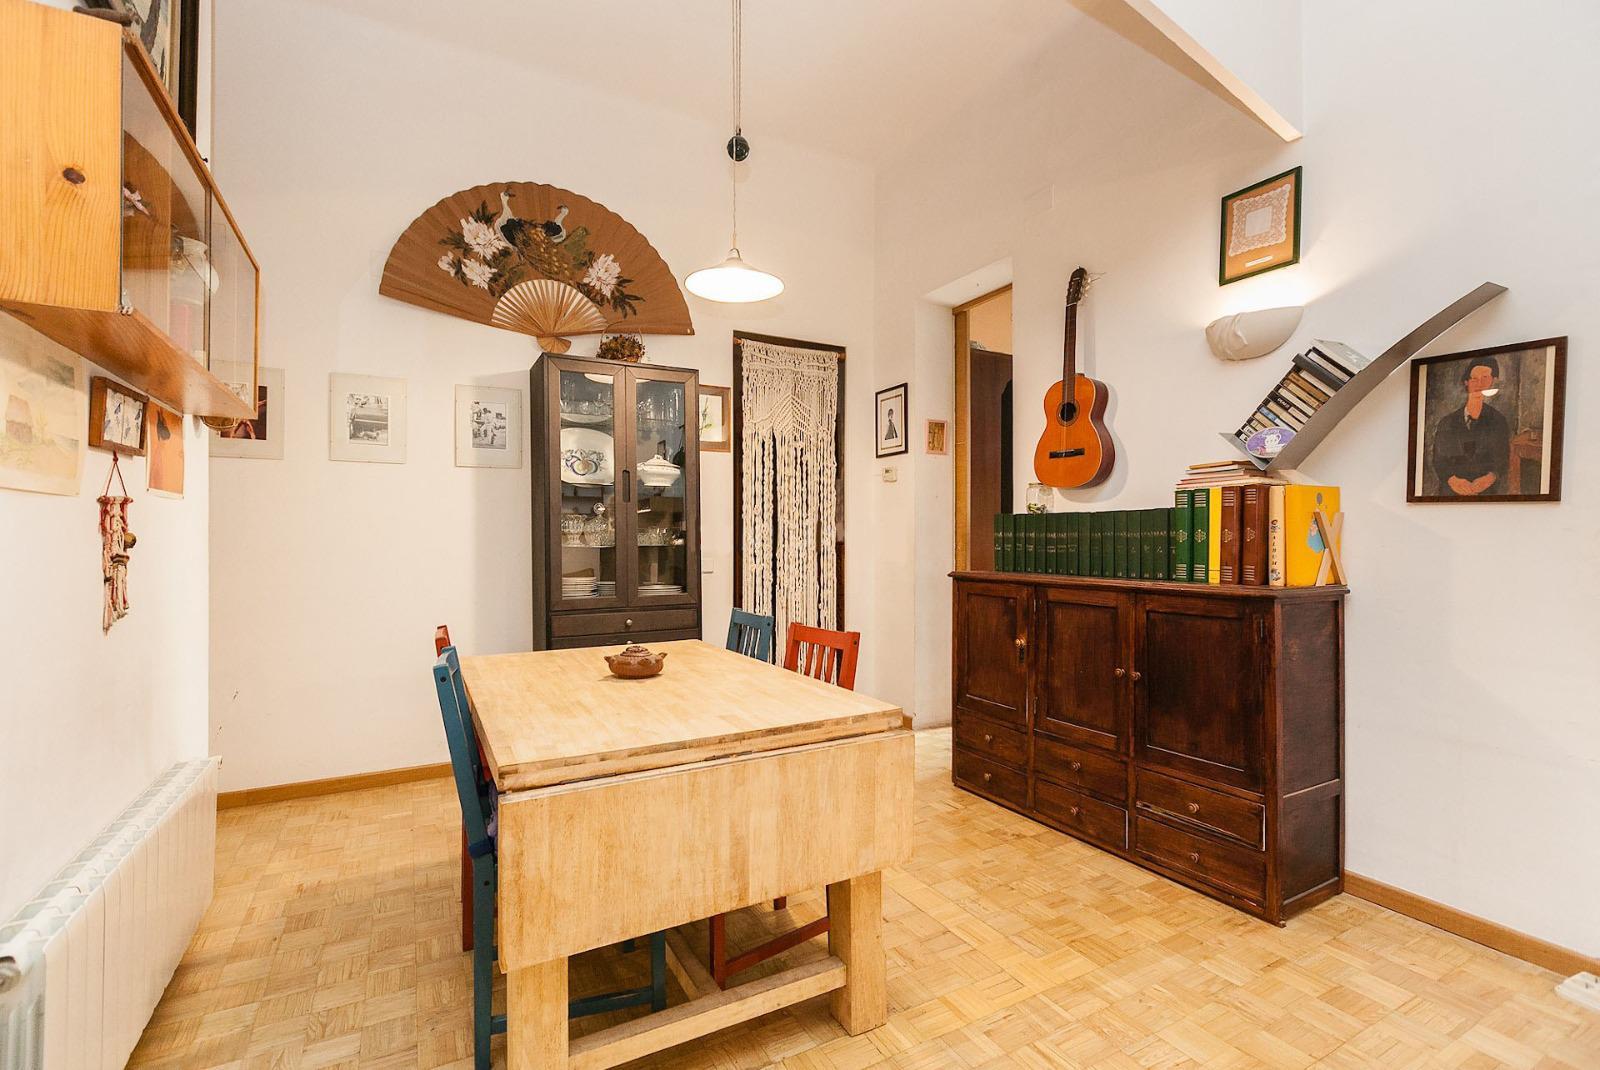 247916 Flat for sale in Sarrià-Sant Gervasi, Sant Gervasi-Galvany 9